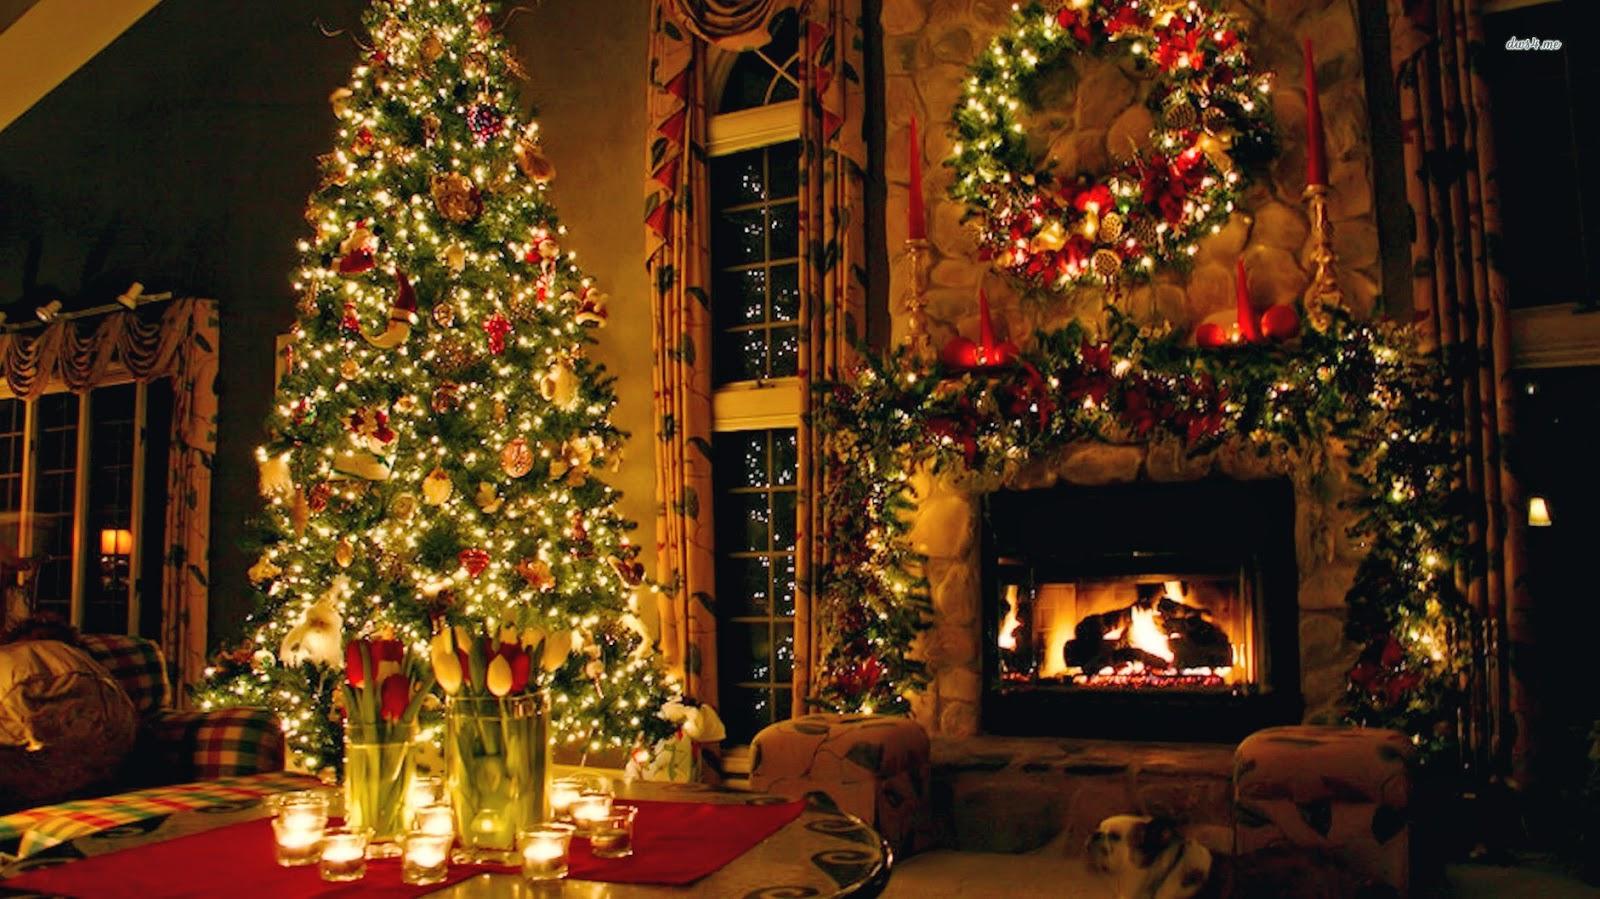 cozy room - Reddit Christmas